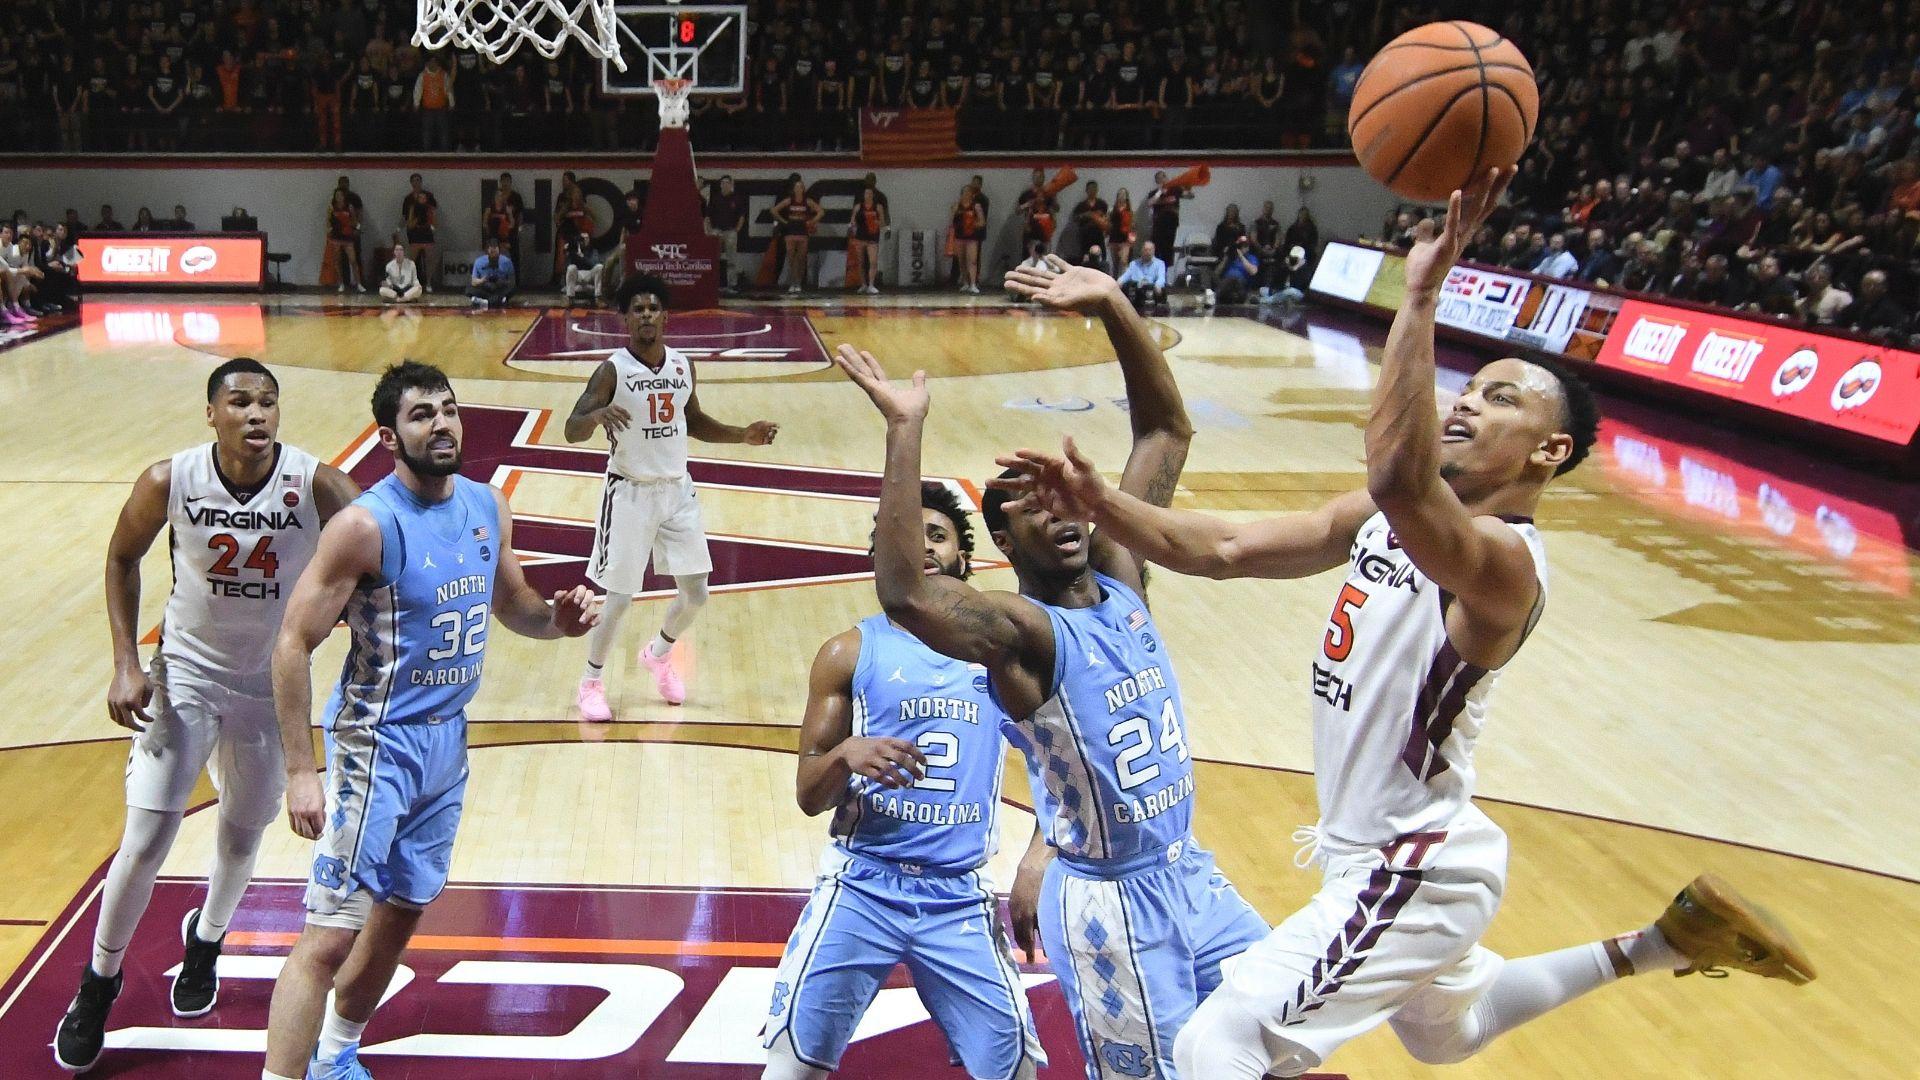 Virginia Tech pulls off upset of North Carolina